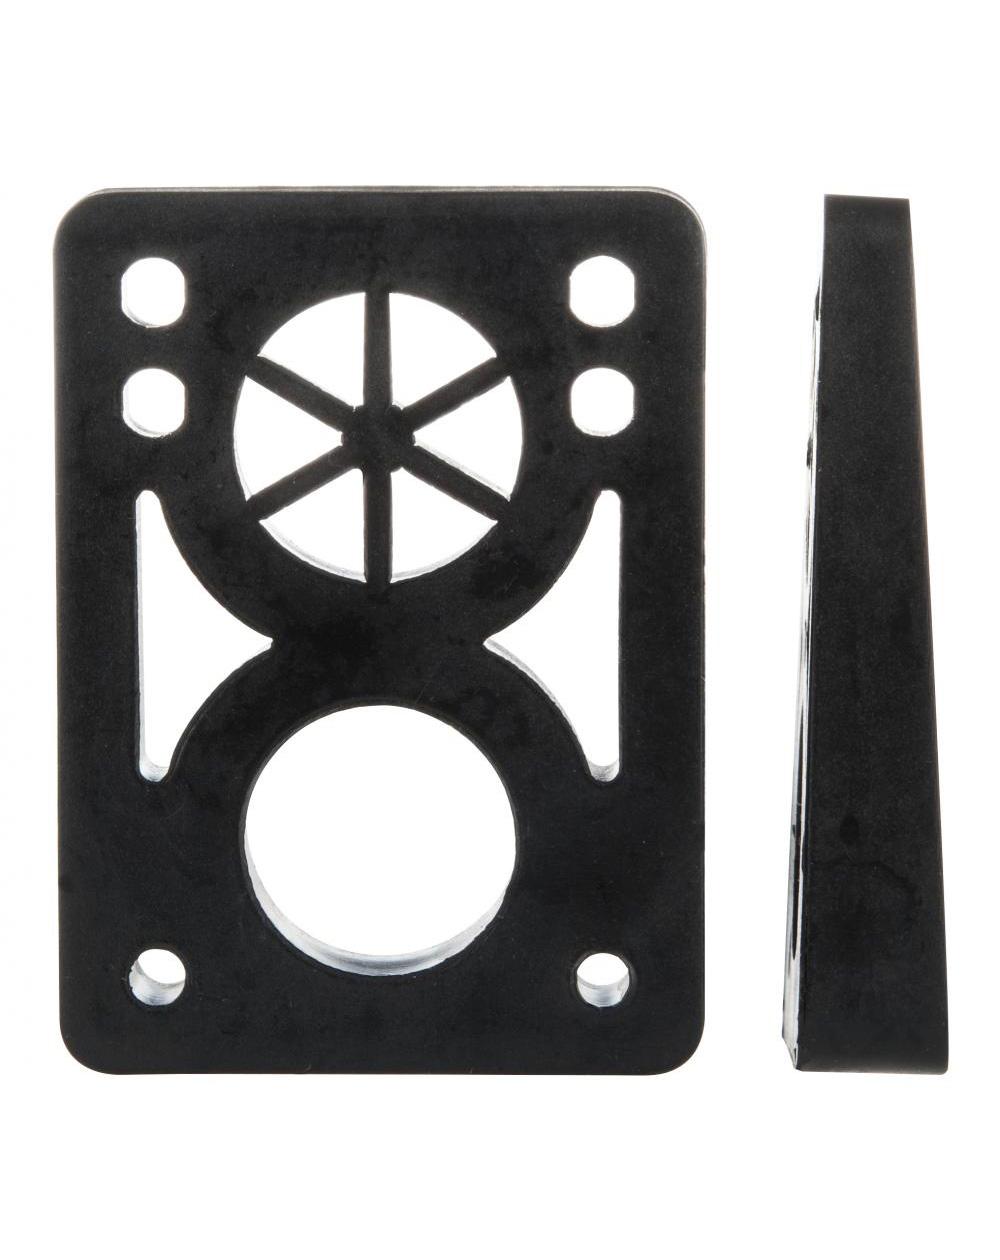 D-Street Riser Soft Wedge 8 to 14 mm Black 2 pz